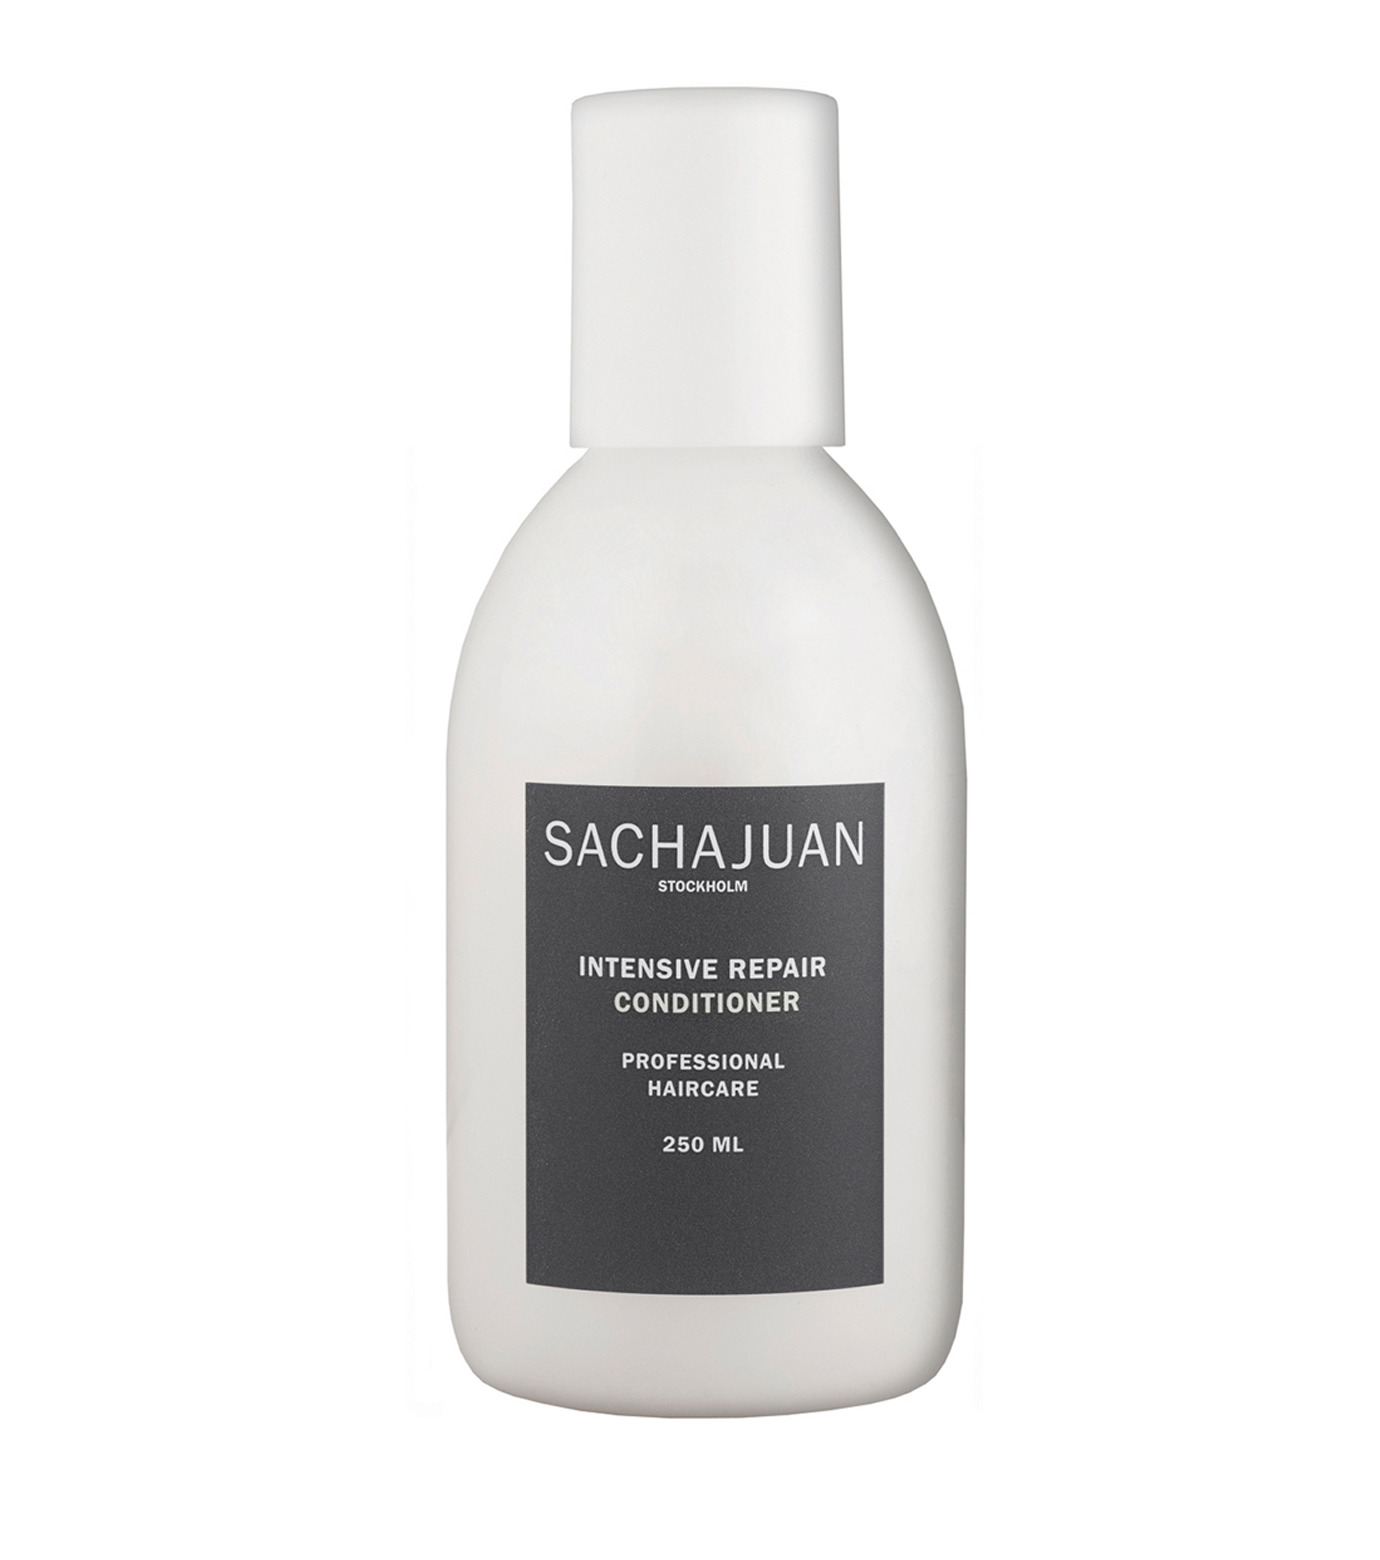 SACHAJUAN(サシャワン)のIntensive Conditioner 250ml-WHITE(HAIR-CARE/HAIR-CARE)-158-4 拡大詳細画像1